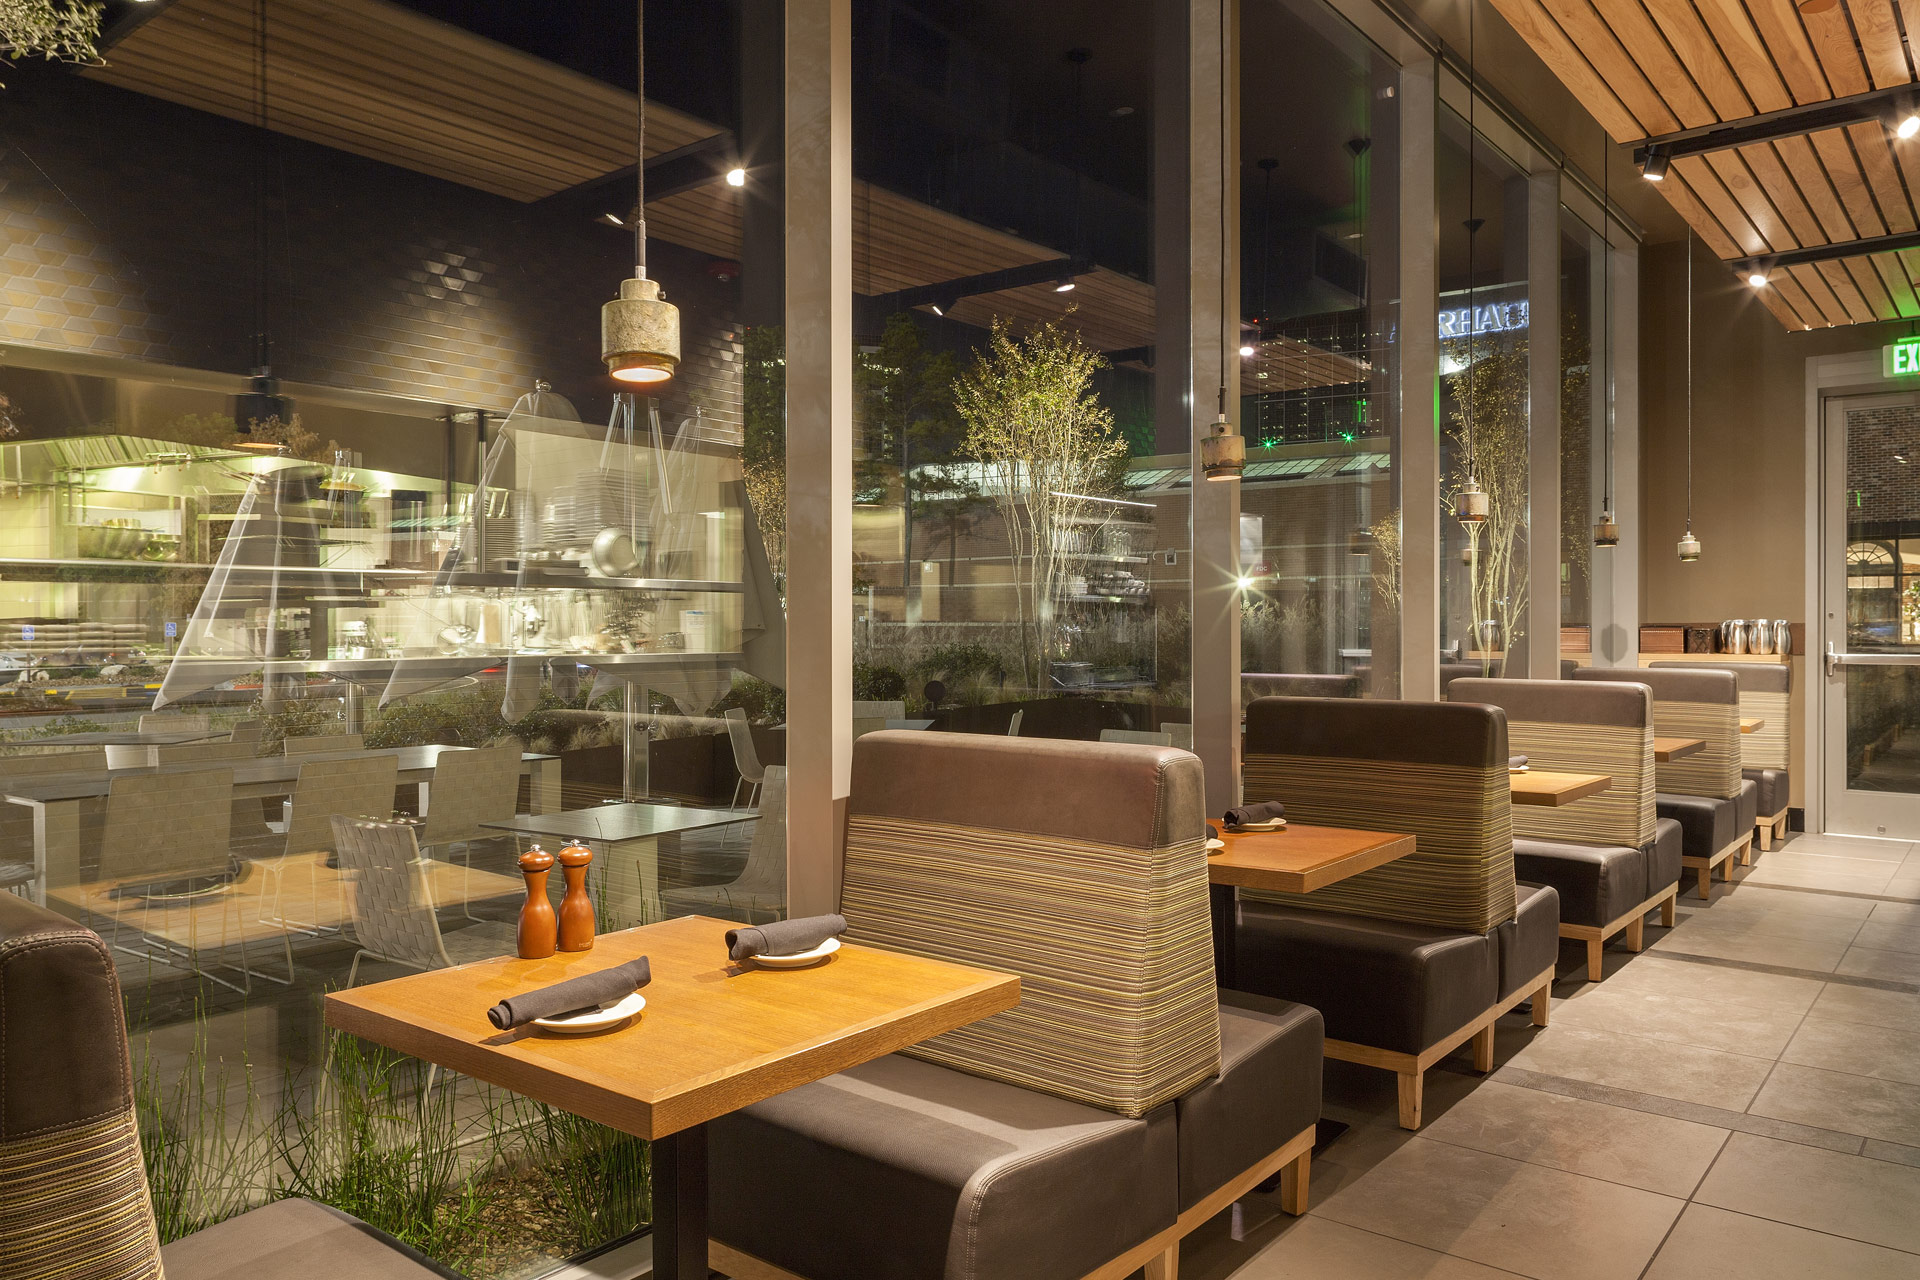 Bazille at Nordstrom Restaurant decor ideas